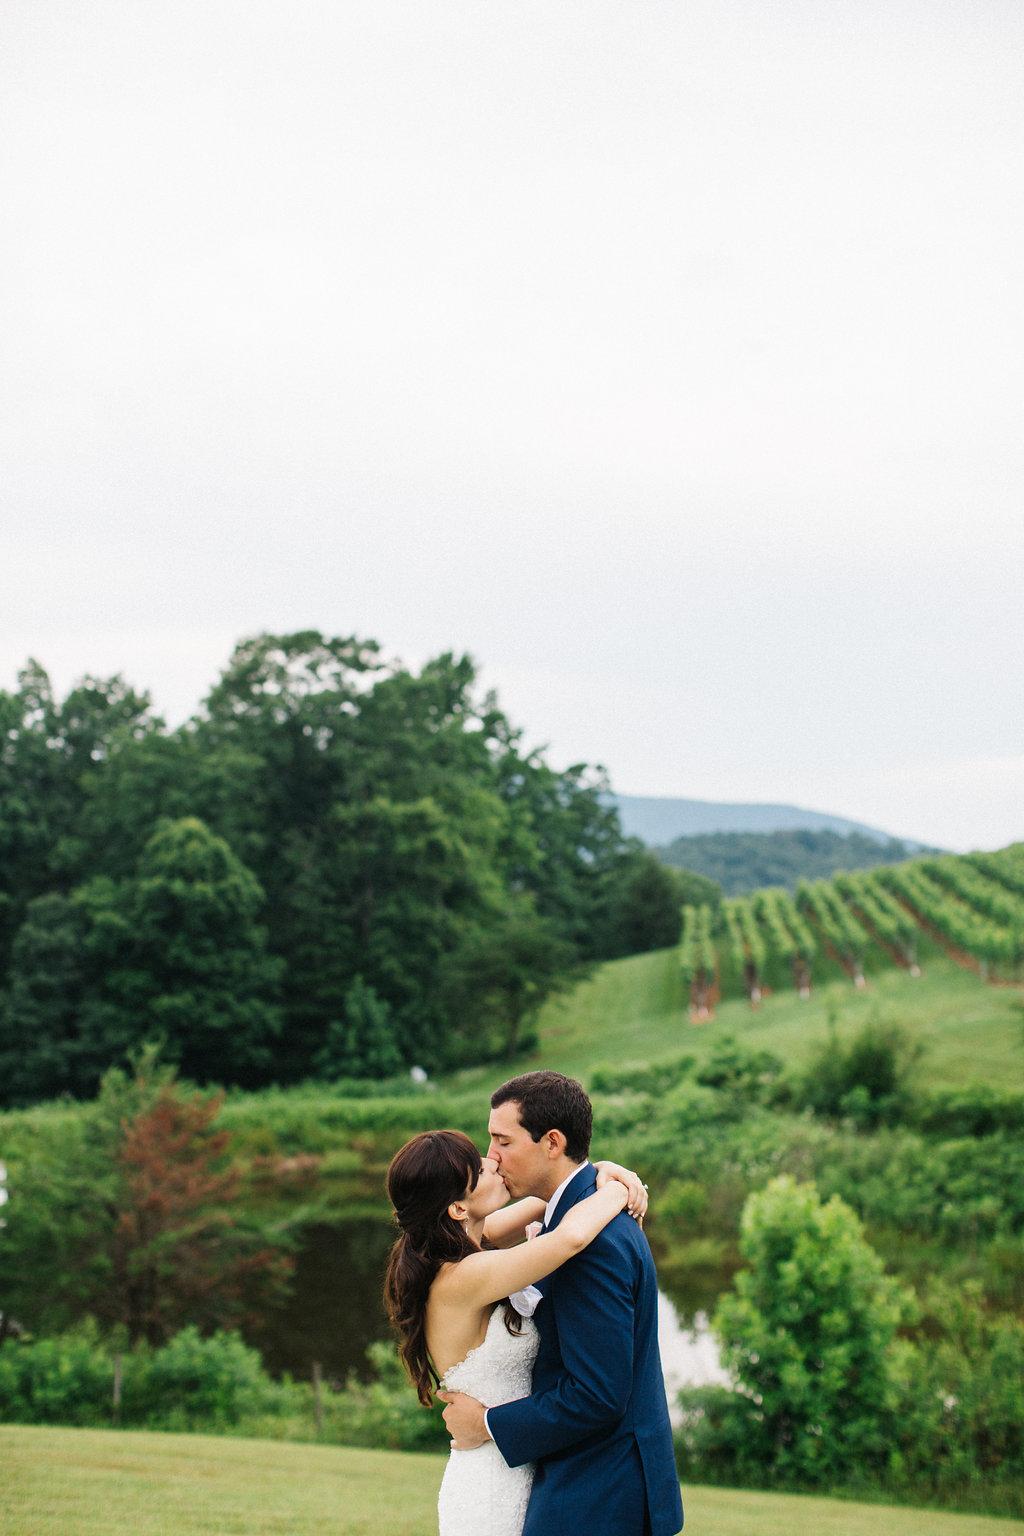 winey-blonde-vineyard-wedding-ideas (3).jpg